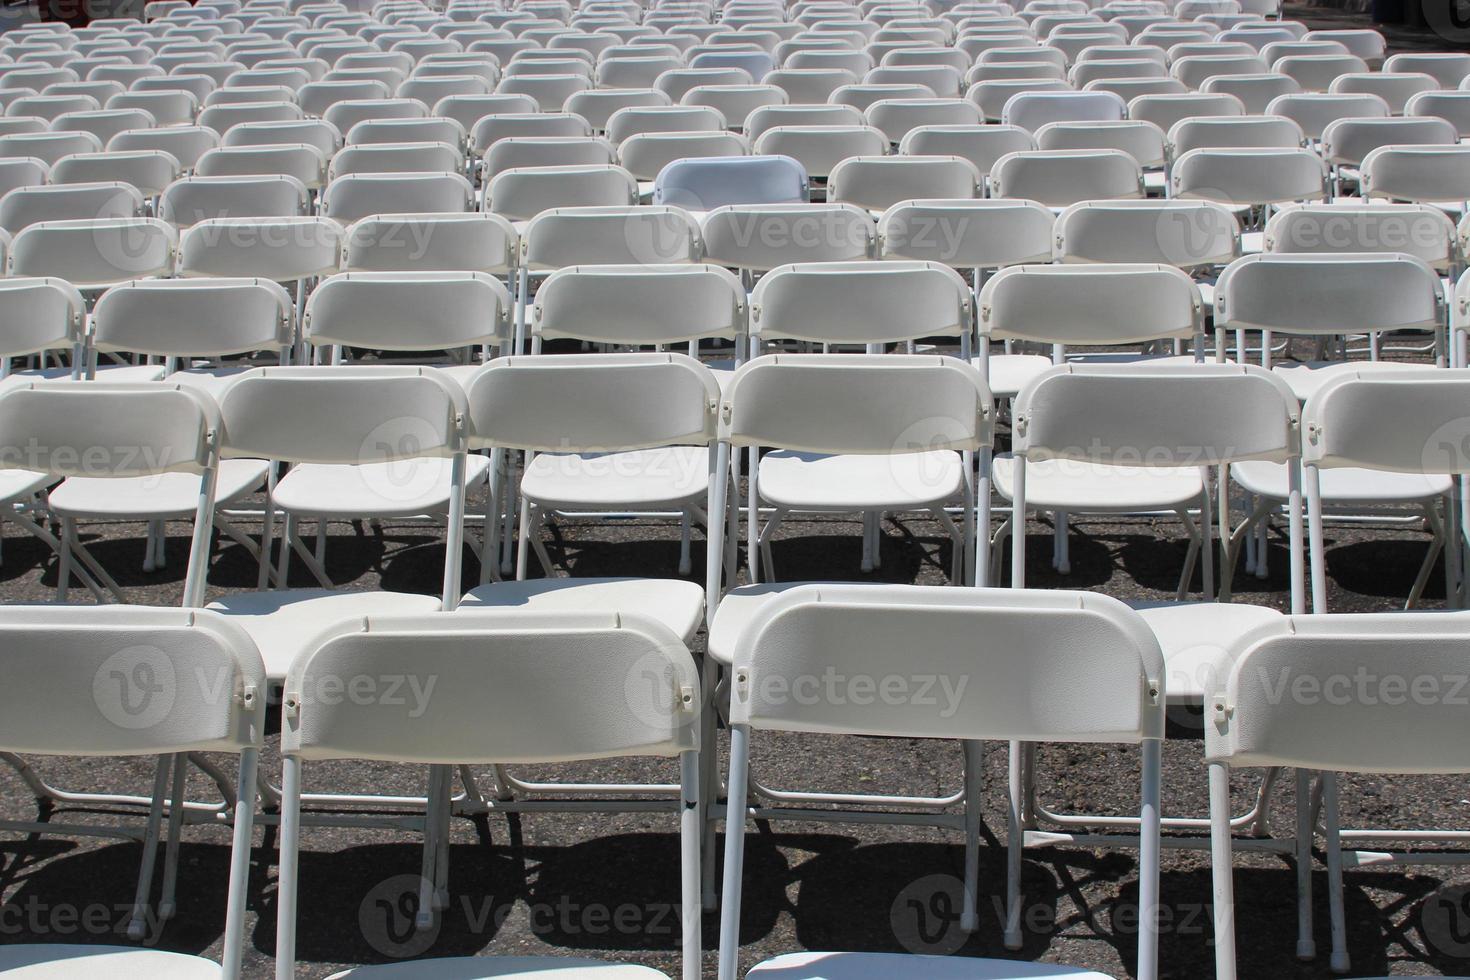 filas de sillas blancas plegables foto